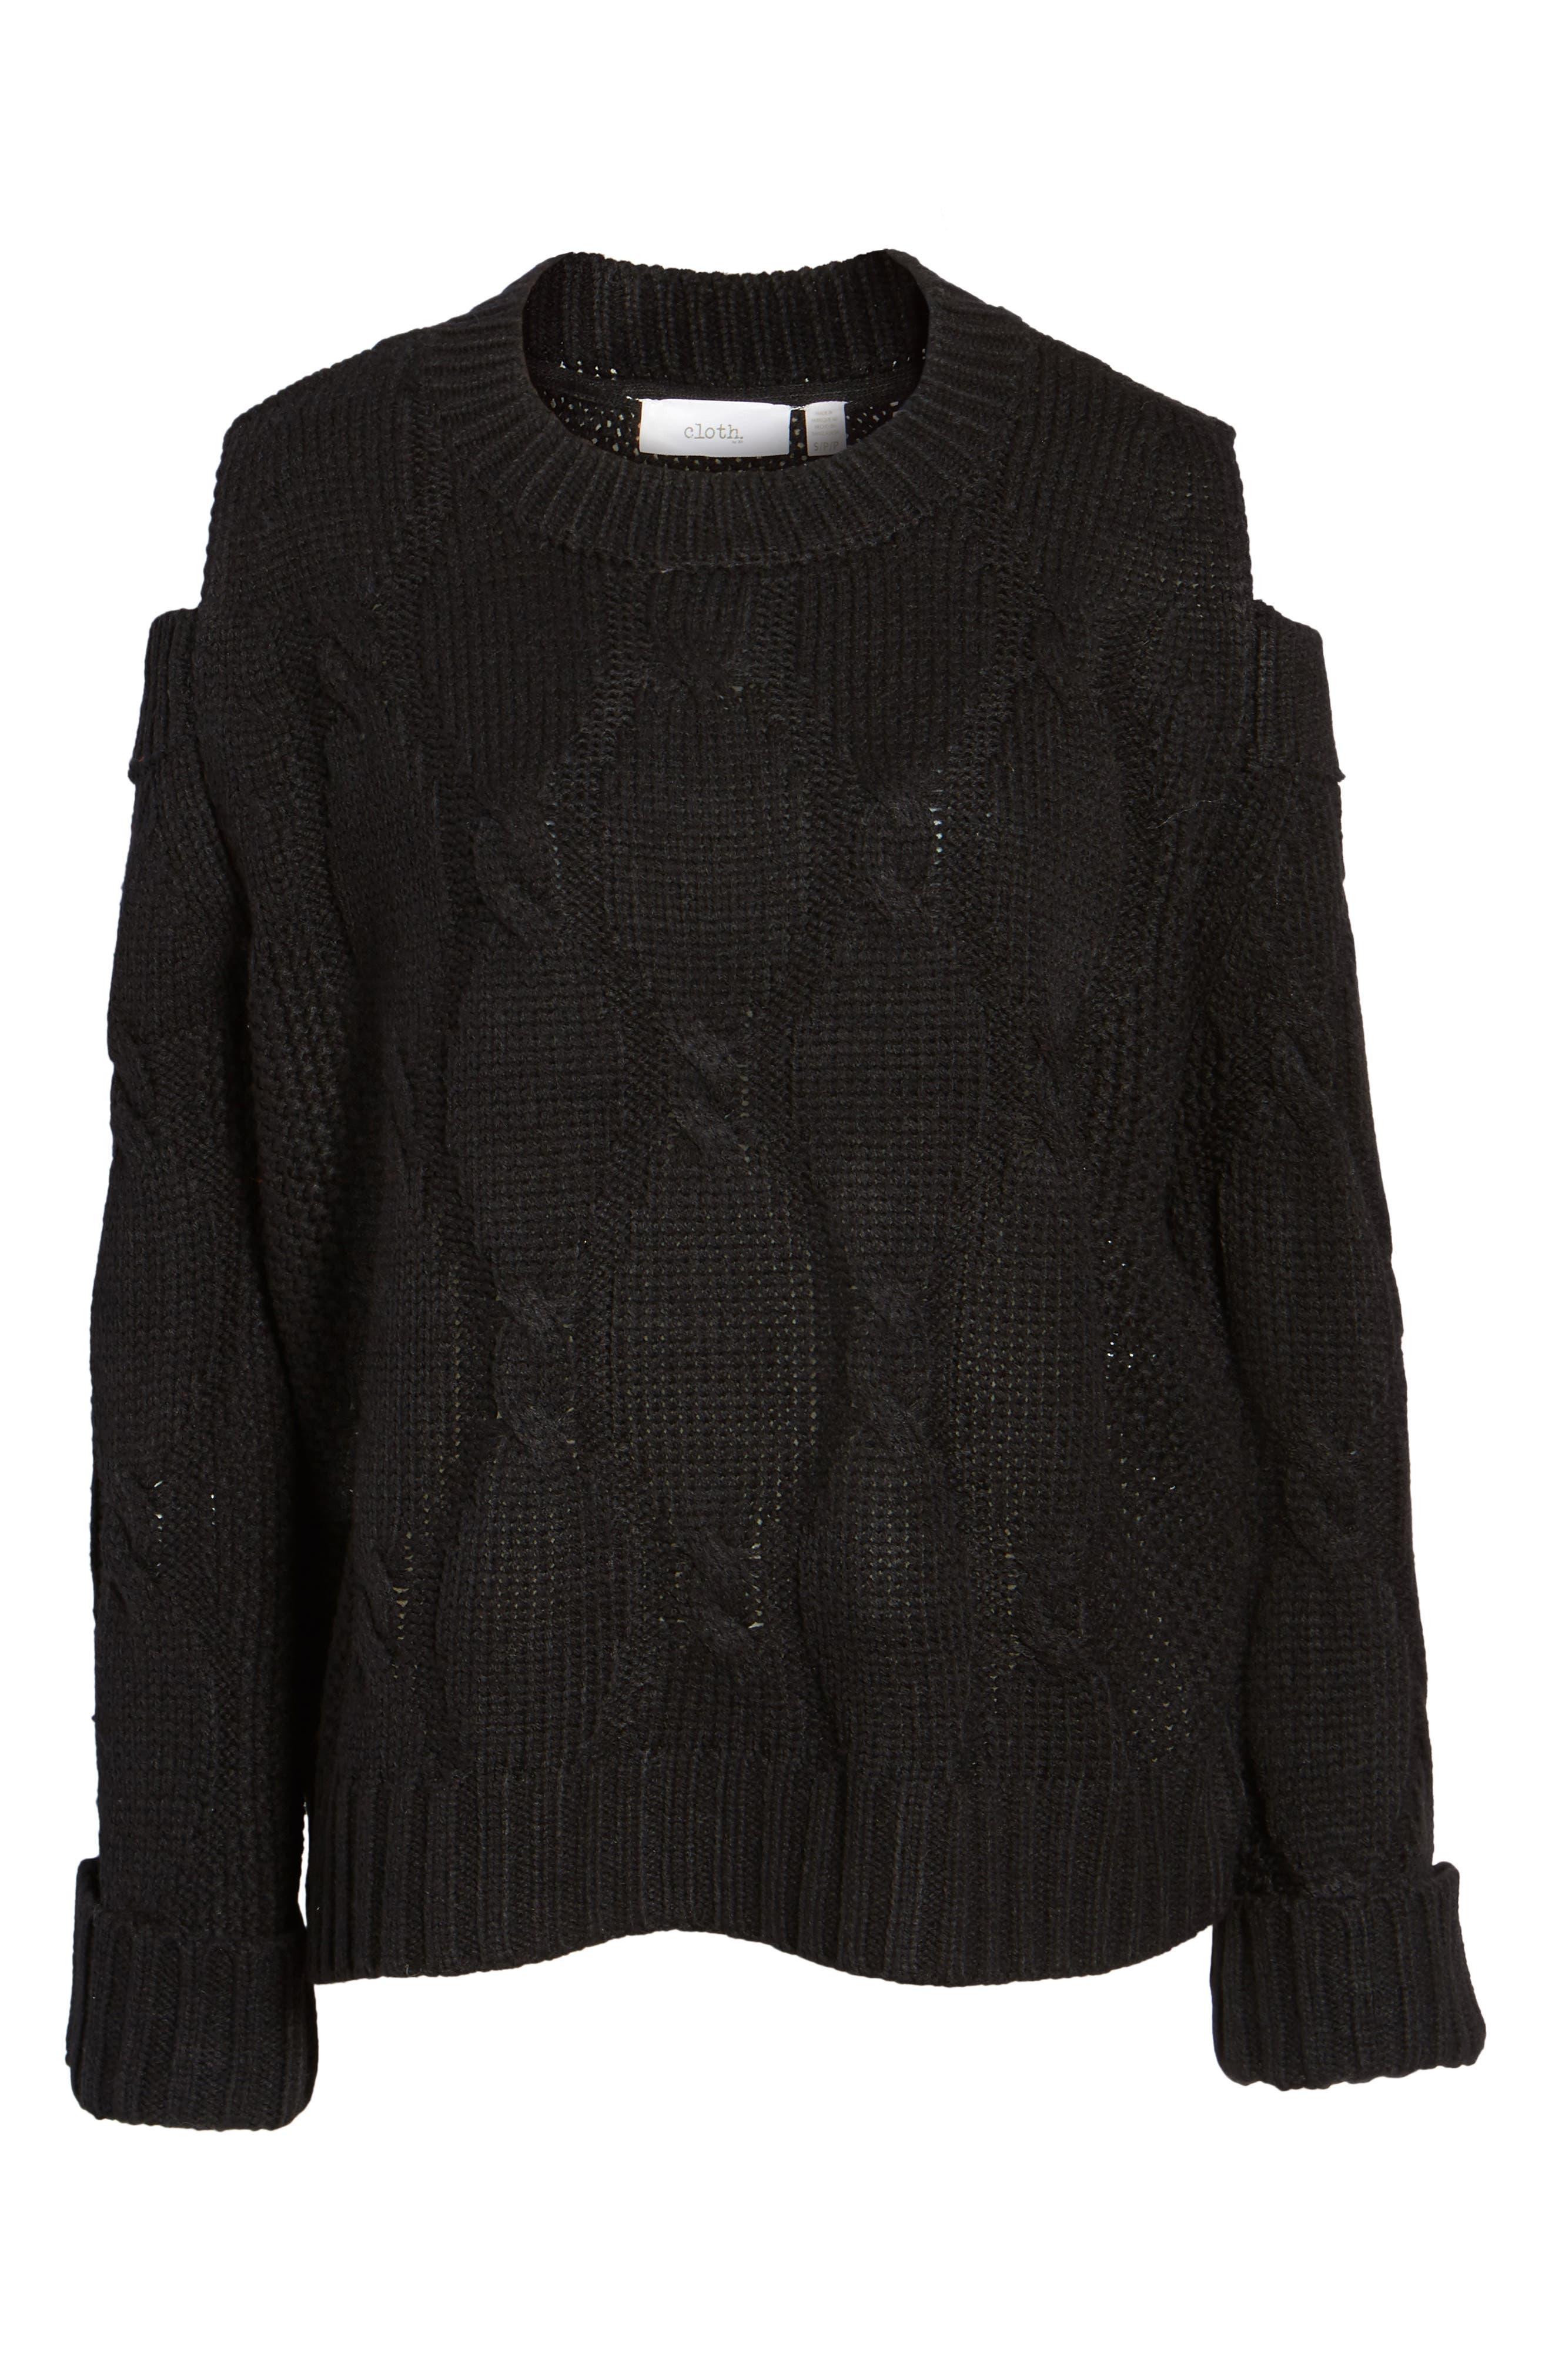 Cold Shoulder Cable Sweater,                             Alternate thumbnail 6, color,                             Black